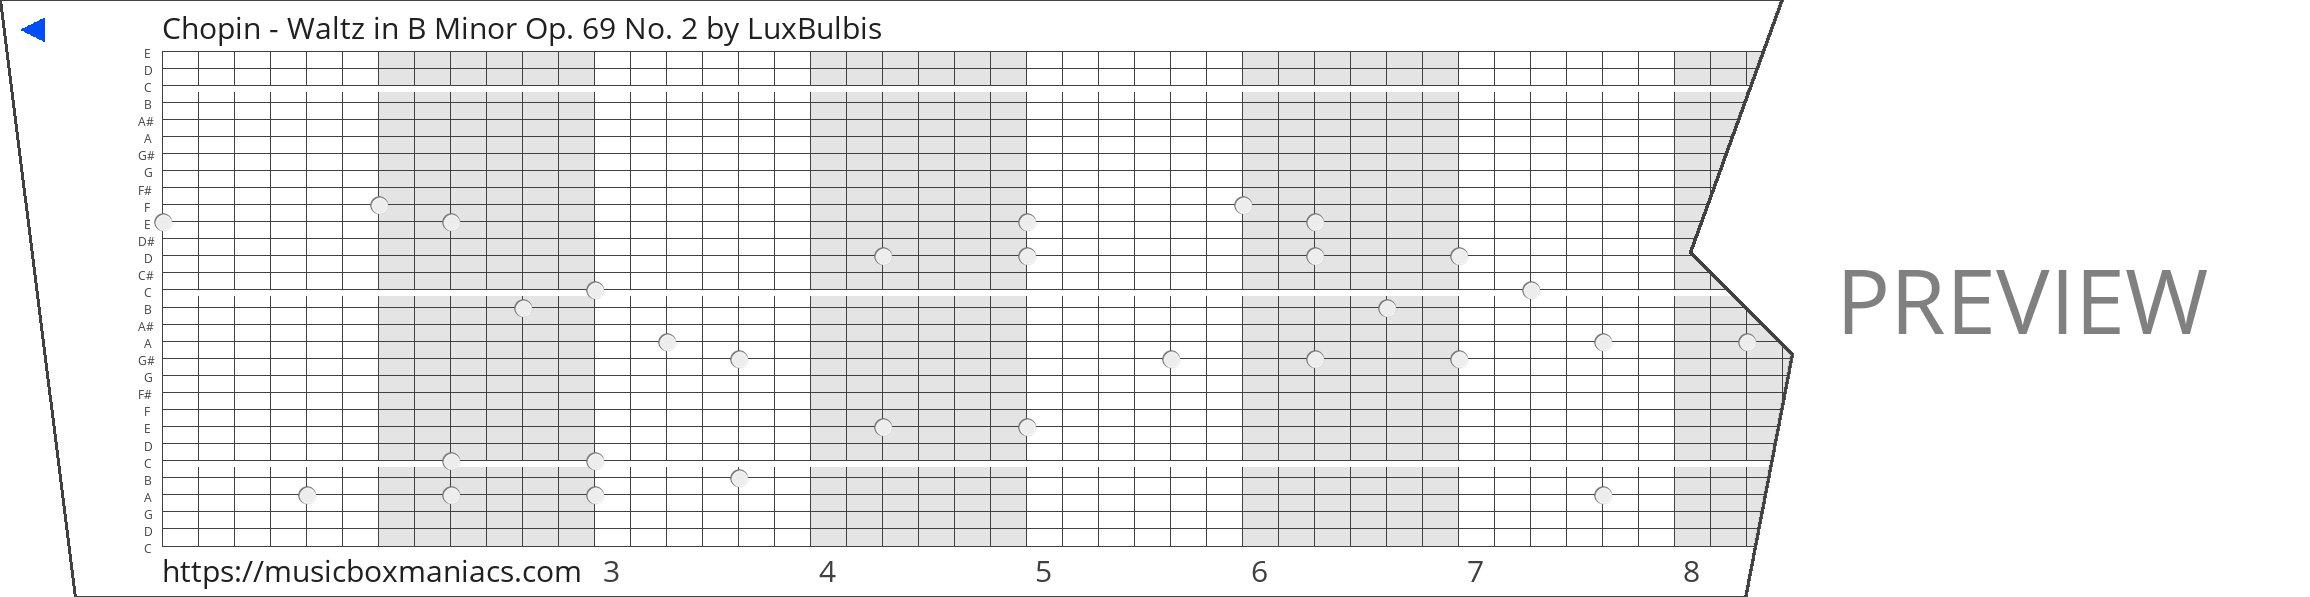 Chopin - Waltz in B Minor Op. 69 No. 2 30 note music box paper strip